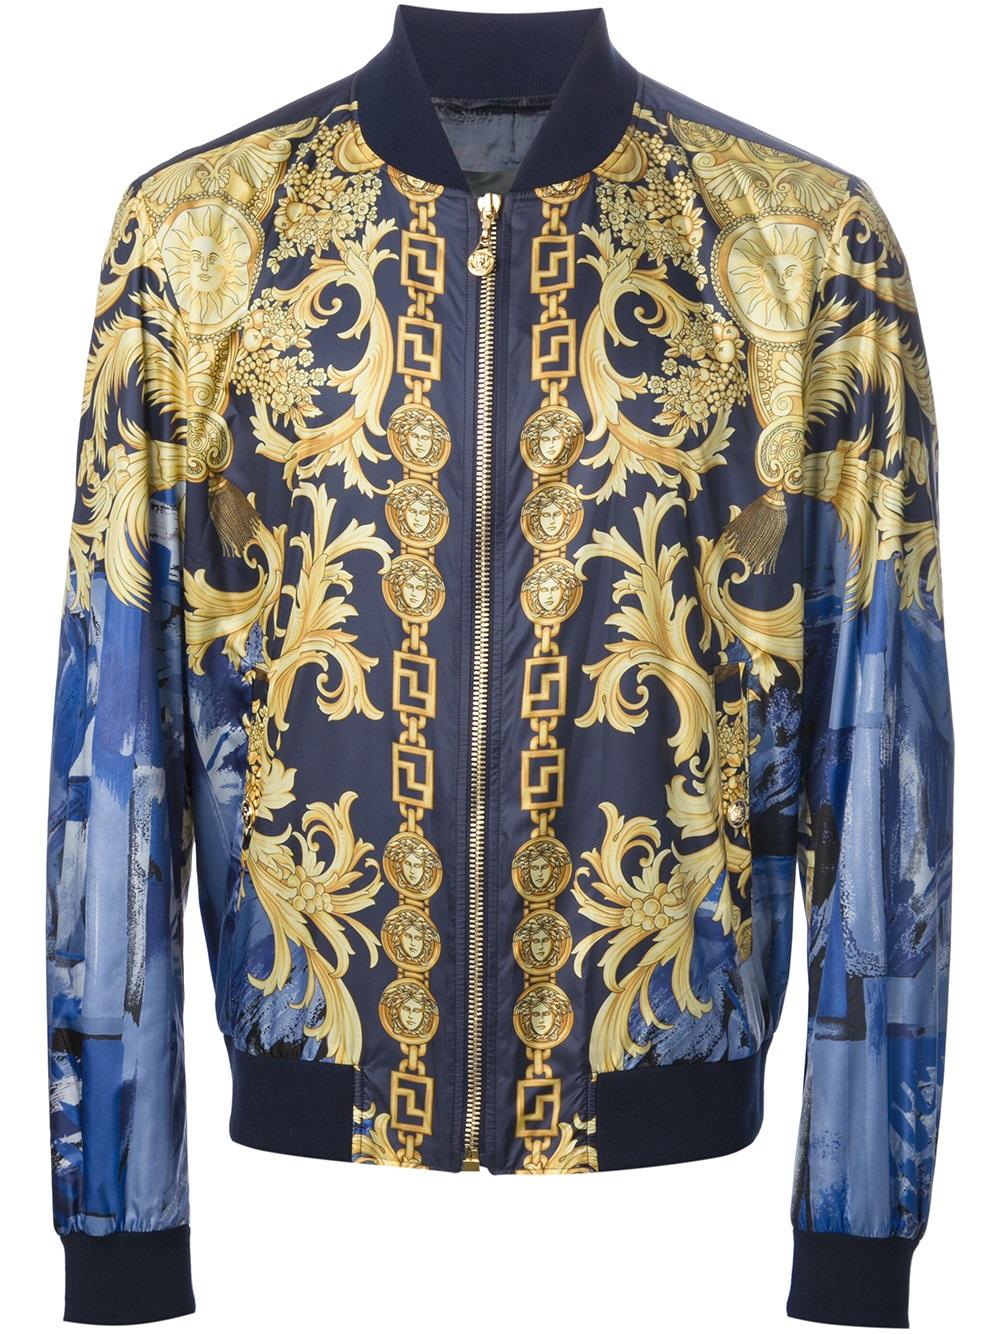 The Trueself Mens Versace Jacket H Amp M